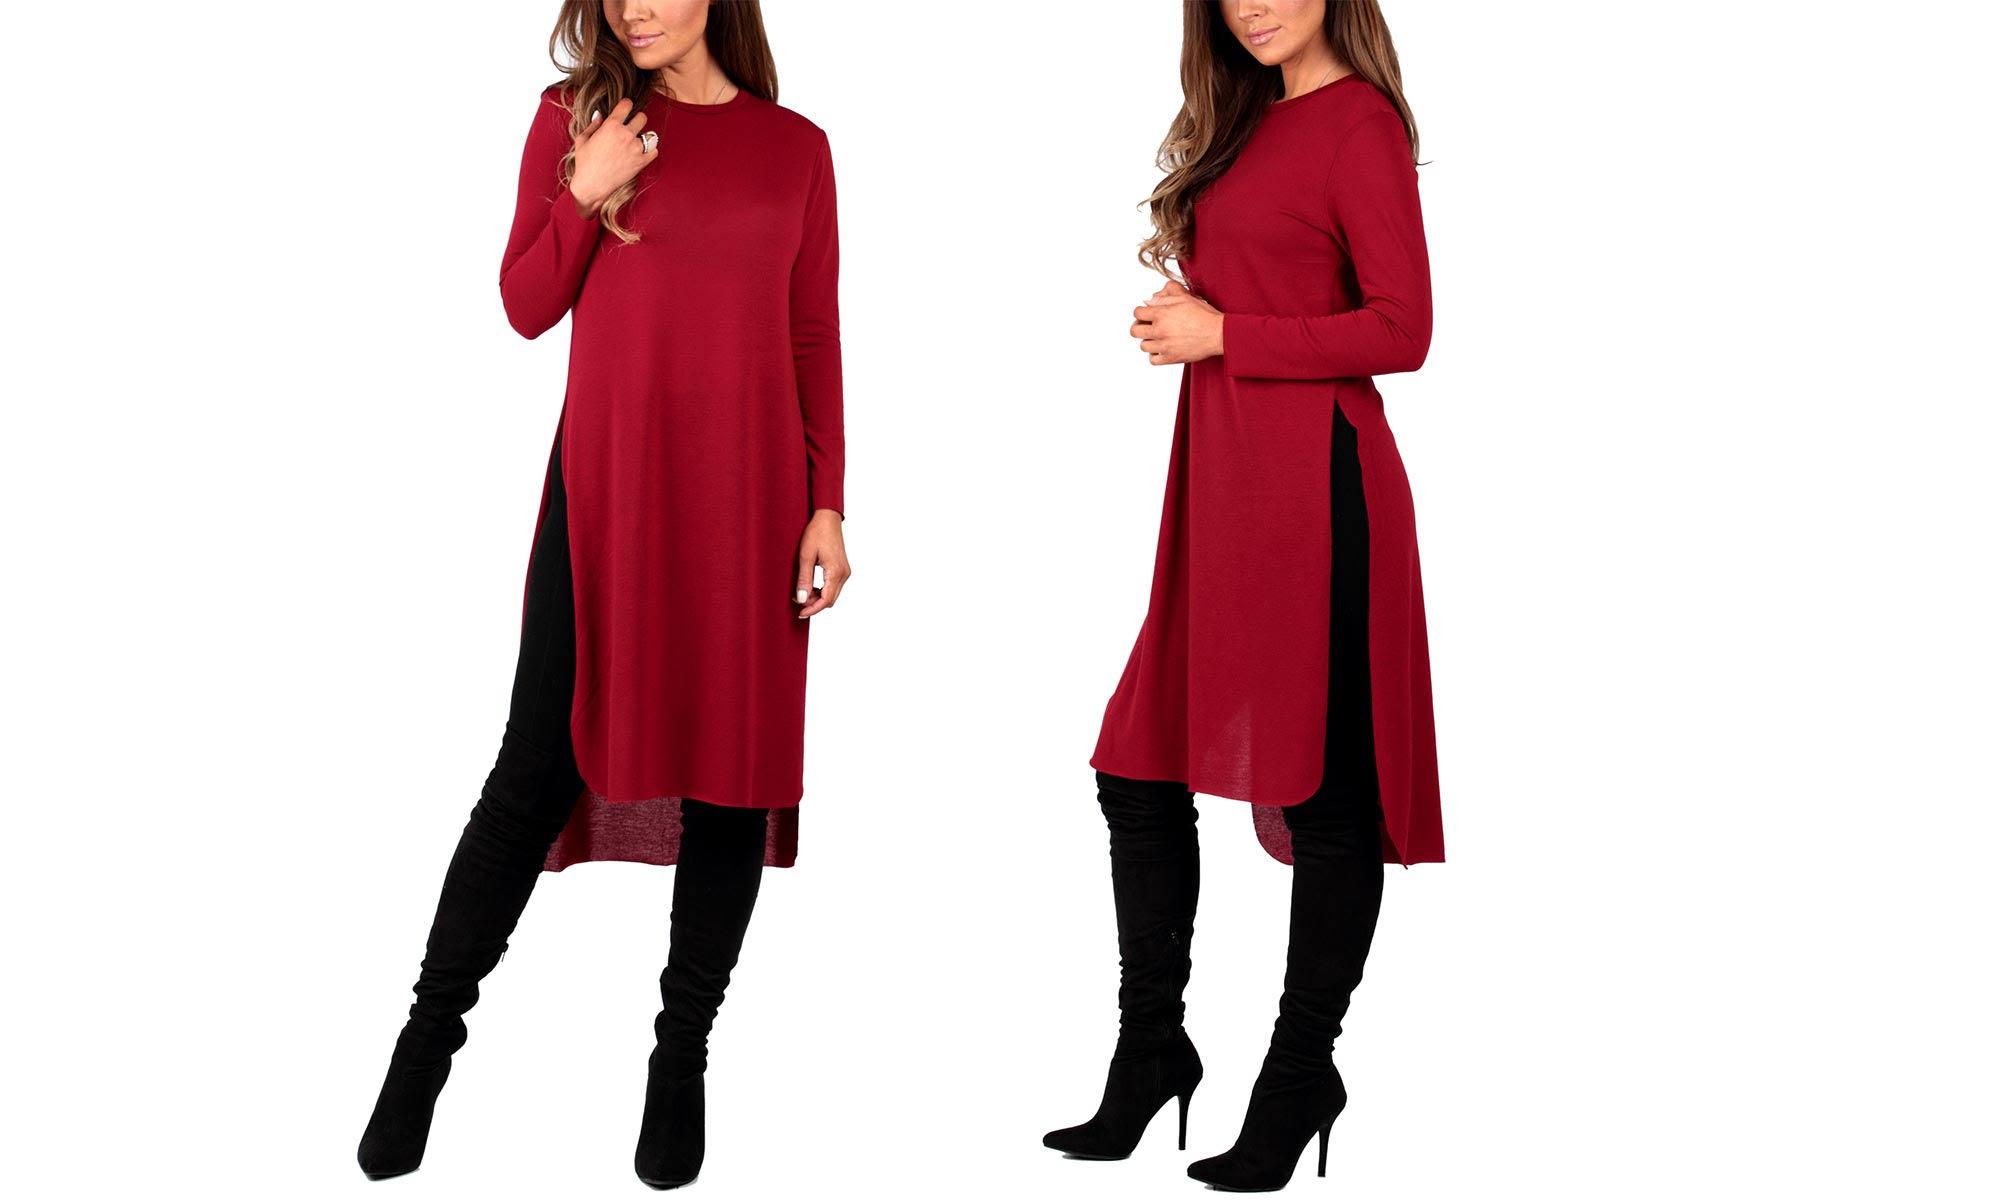 Plus Geschlitztes California Rot Tunika Trading Frauen tunika Seitlich Group kleid qzzPwaT